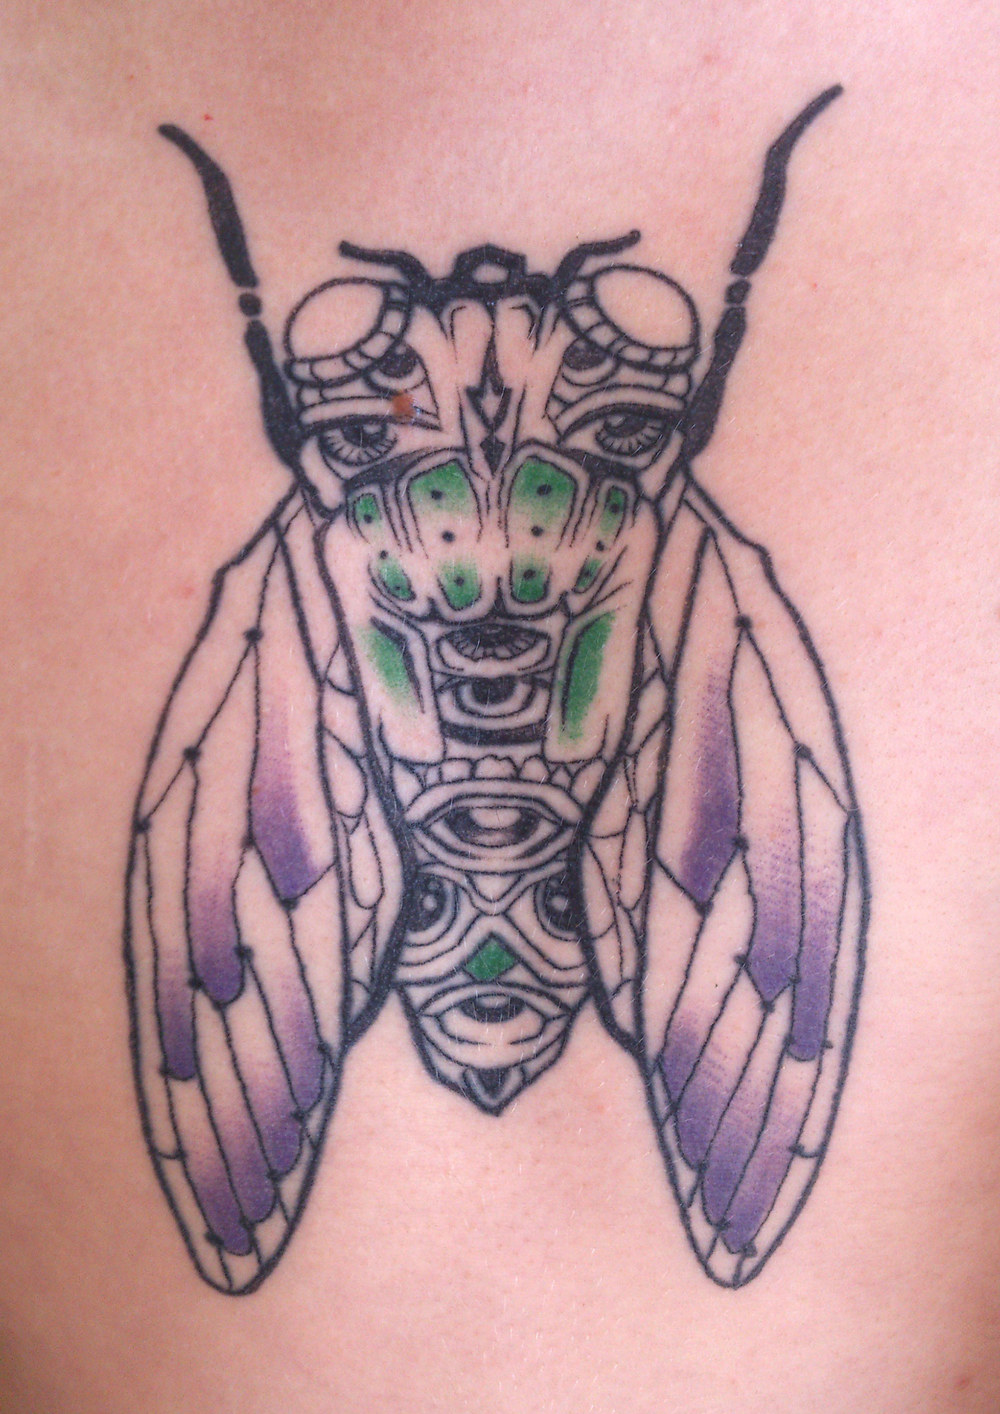 first inked tattoo design sam shennan ud3 sydney illustrator artist murals tattoos. Black Bedroom Furniture Sets. Home Design Ideas